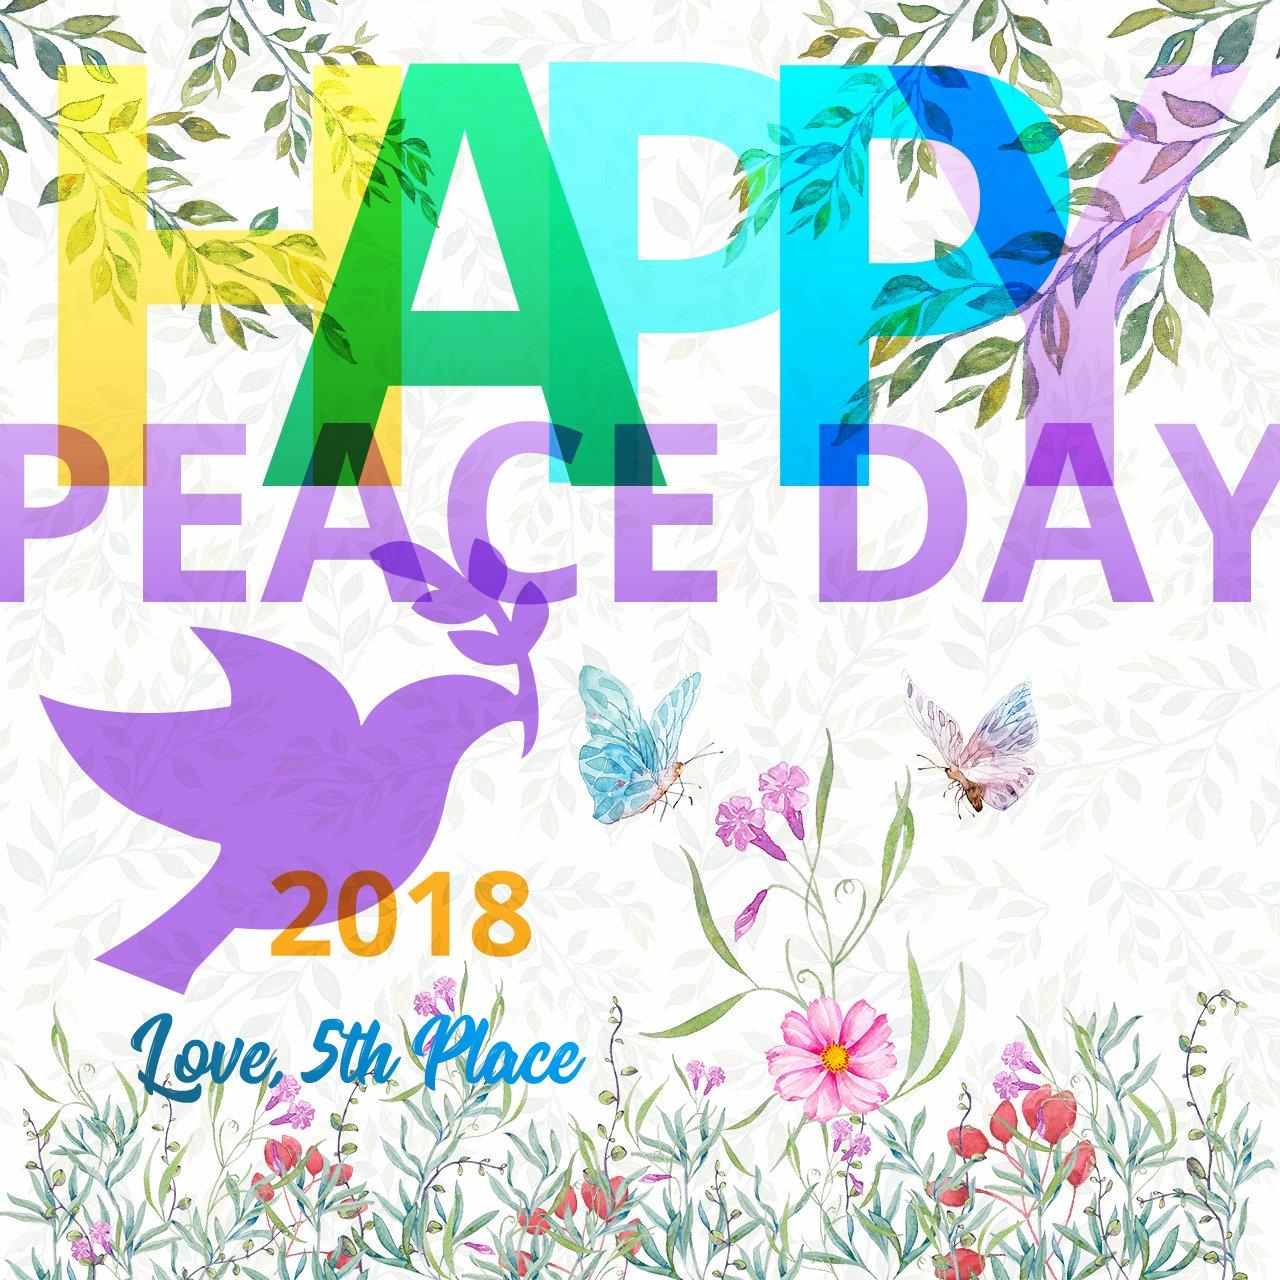 Celebrating International Day of Peace on 21 September